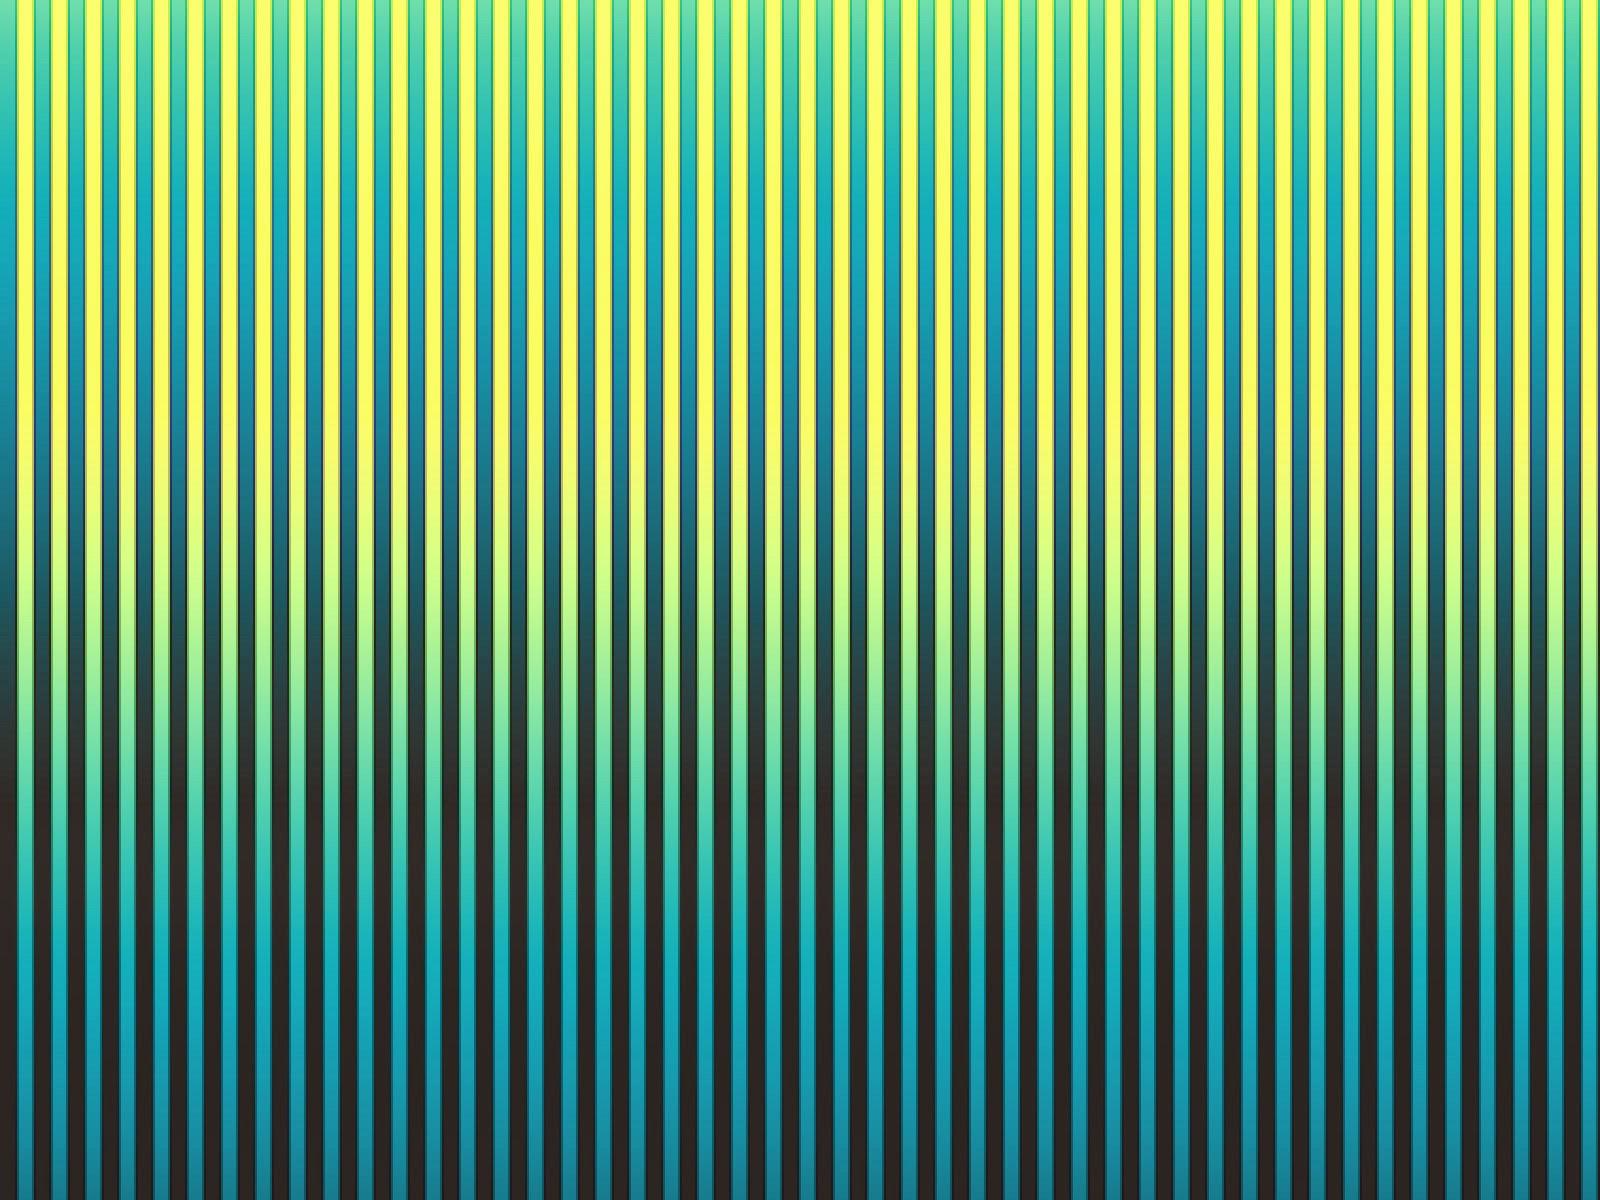 sh yn design stripe pattern wallpaper aqua blue black. Black Bedroom Furniture Sets. Home Design Ideas